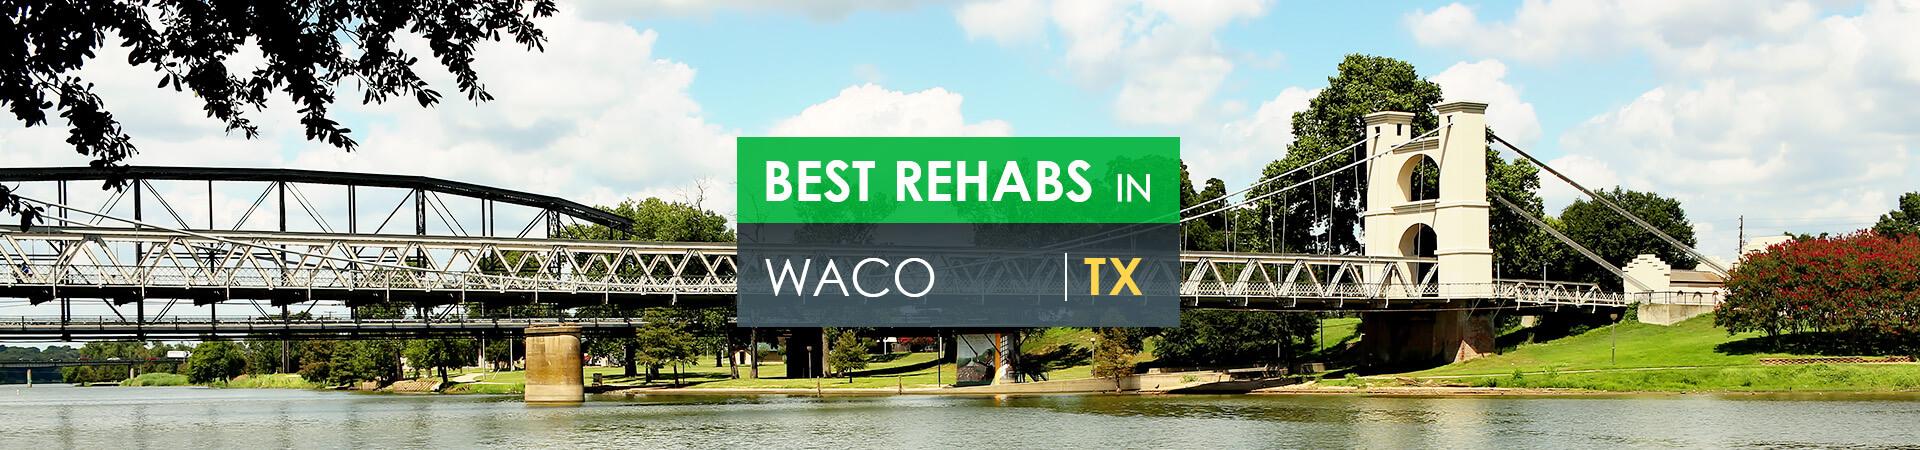 Best rehabs in Waco, TX